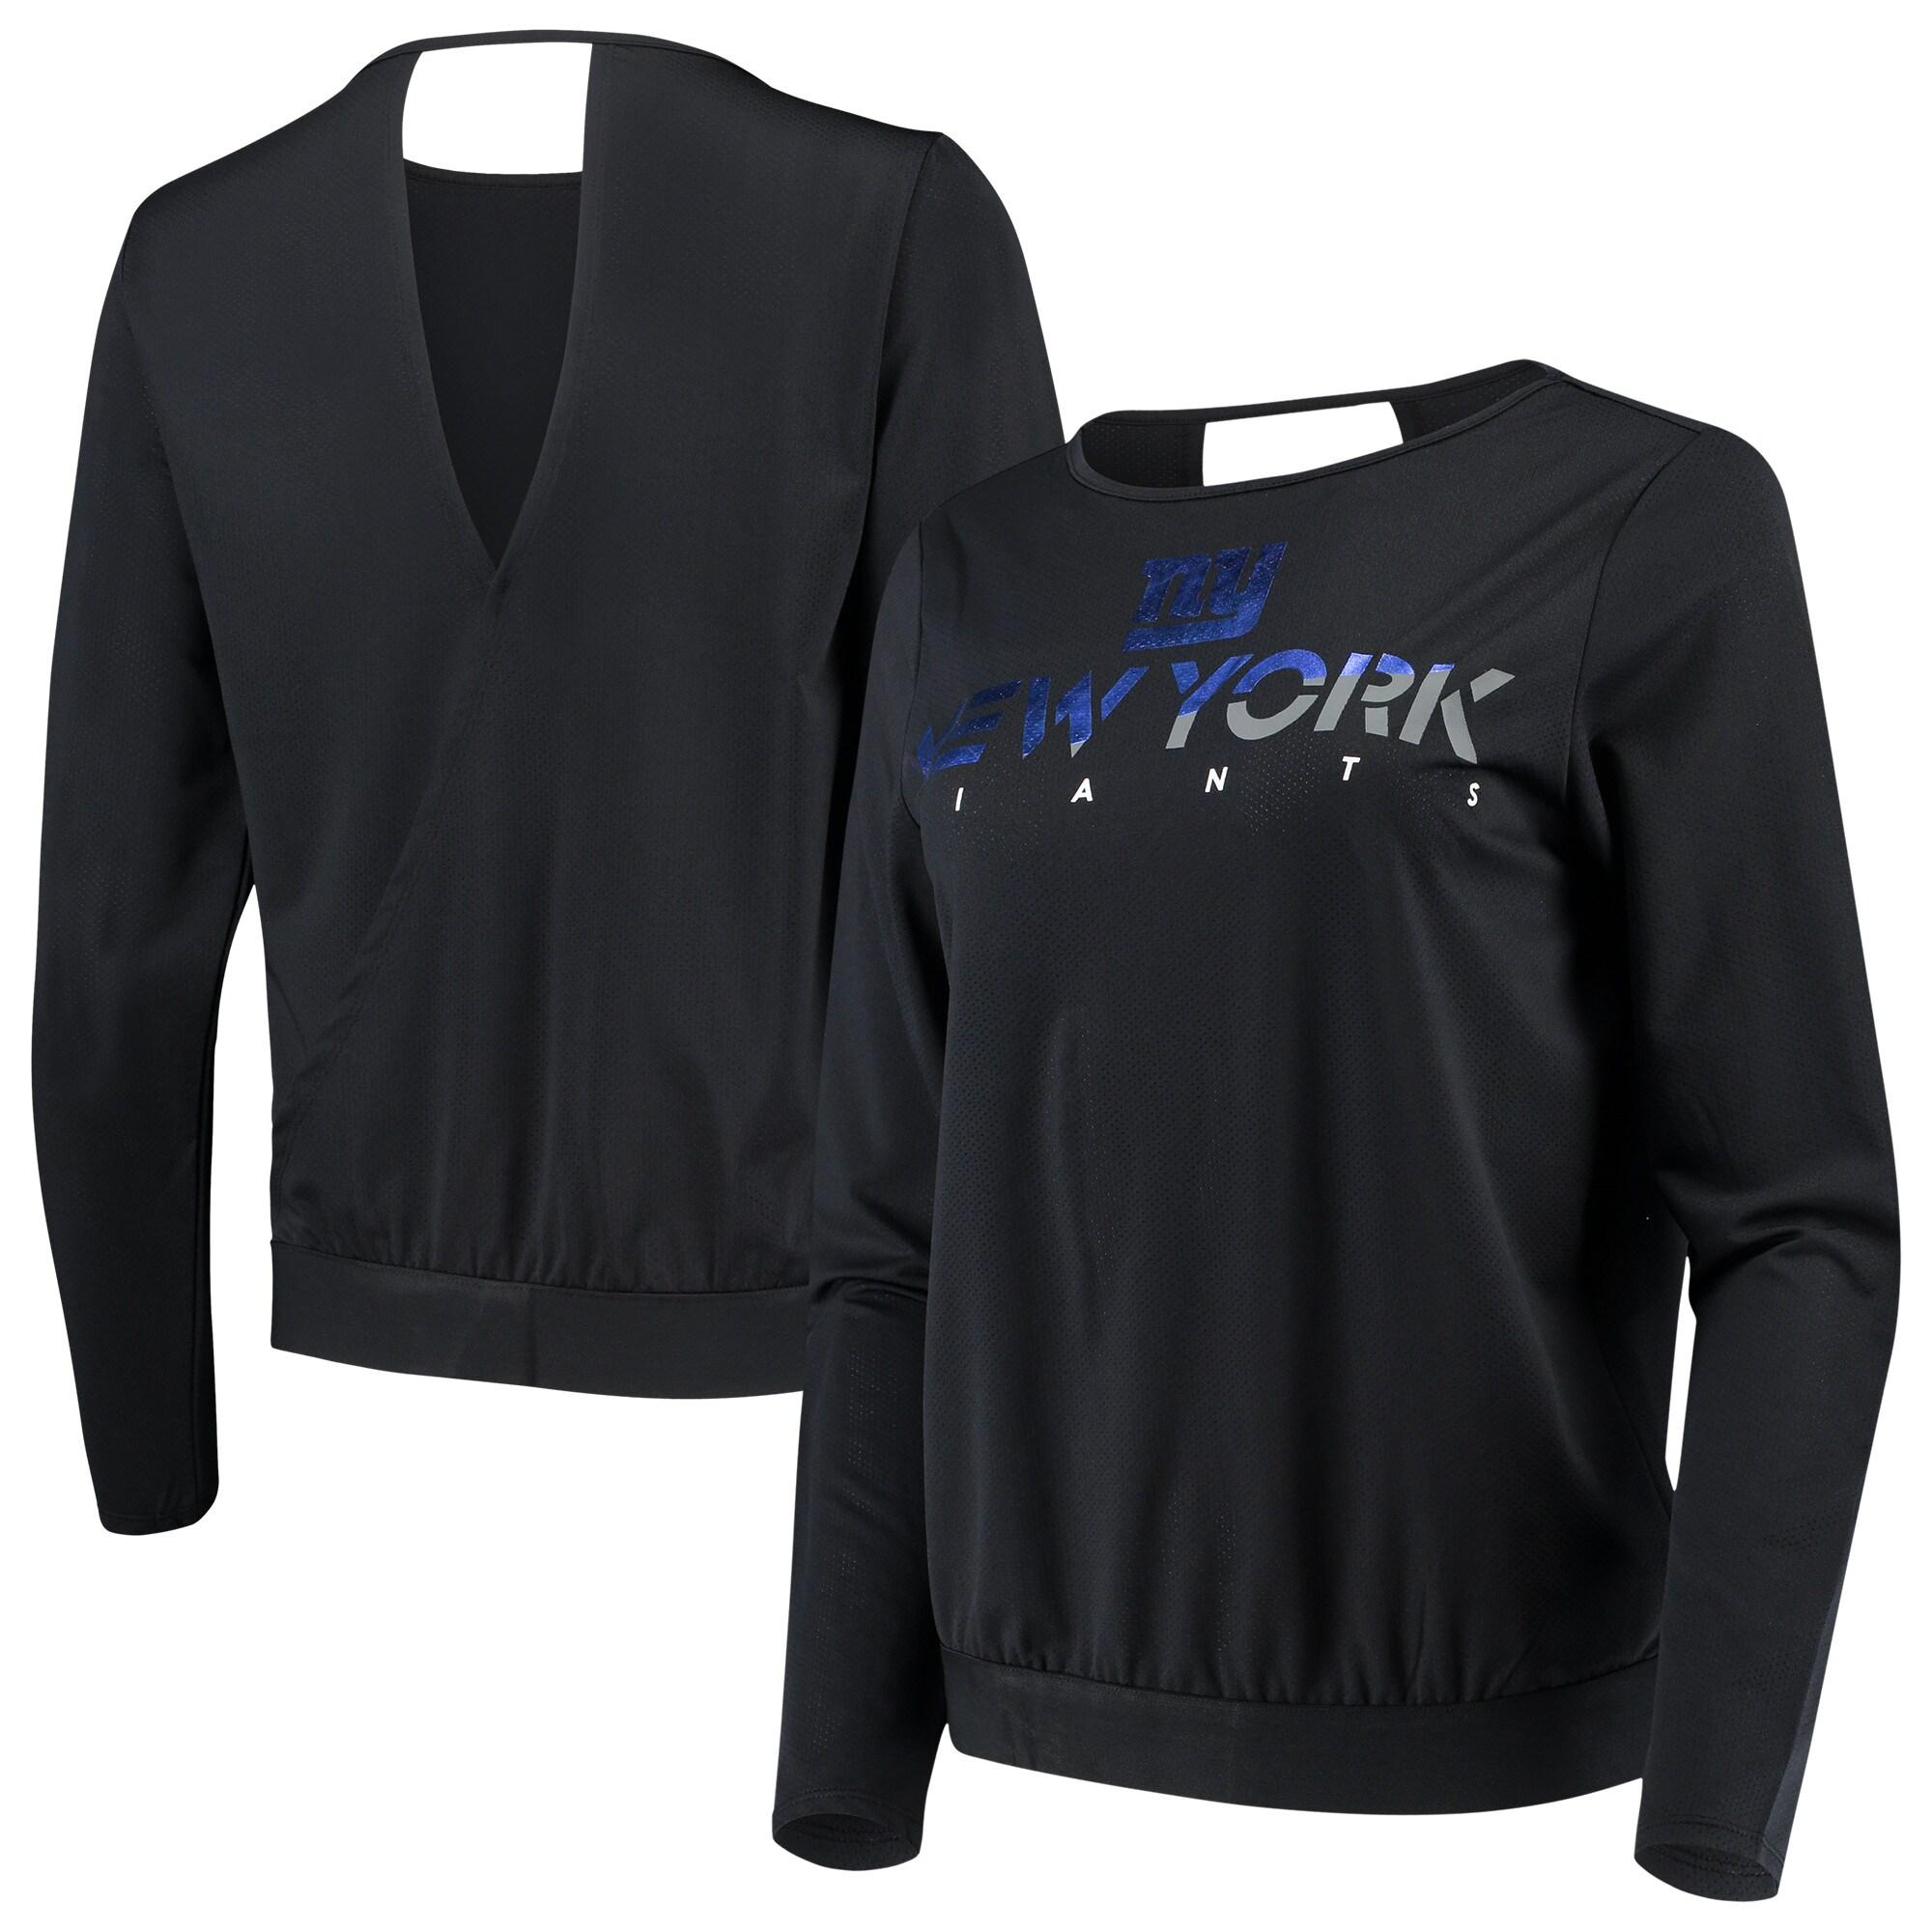 New York Giants Touch by Alyssa Milano Women's Breeze Back Long Sleeve T-Shirt - Black